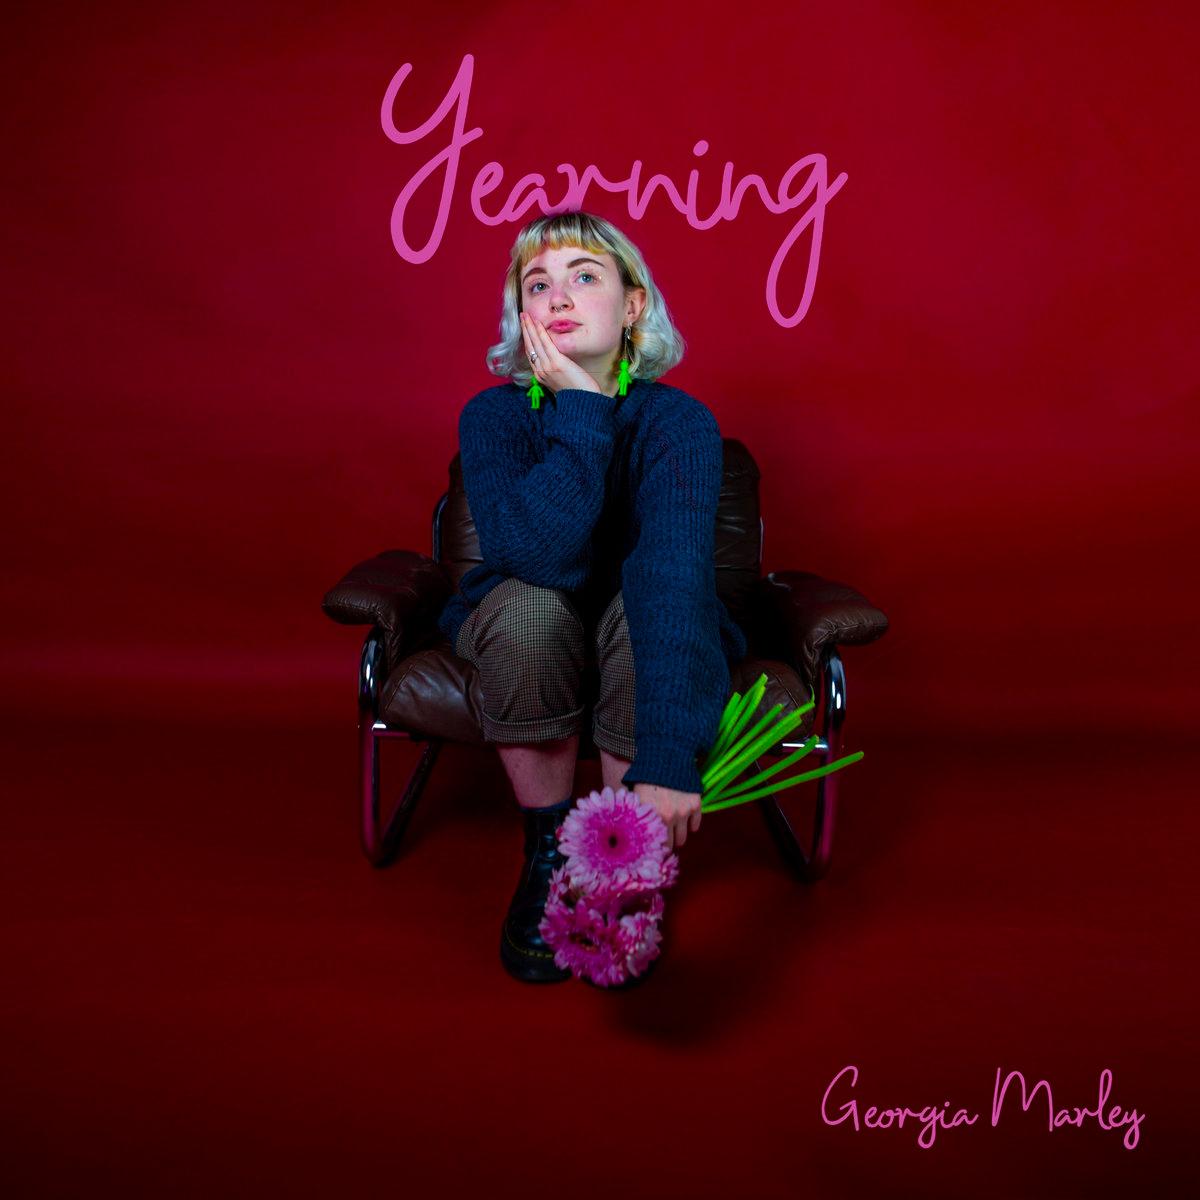 Georgia Marley Yearning album